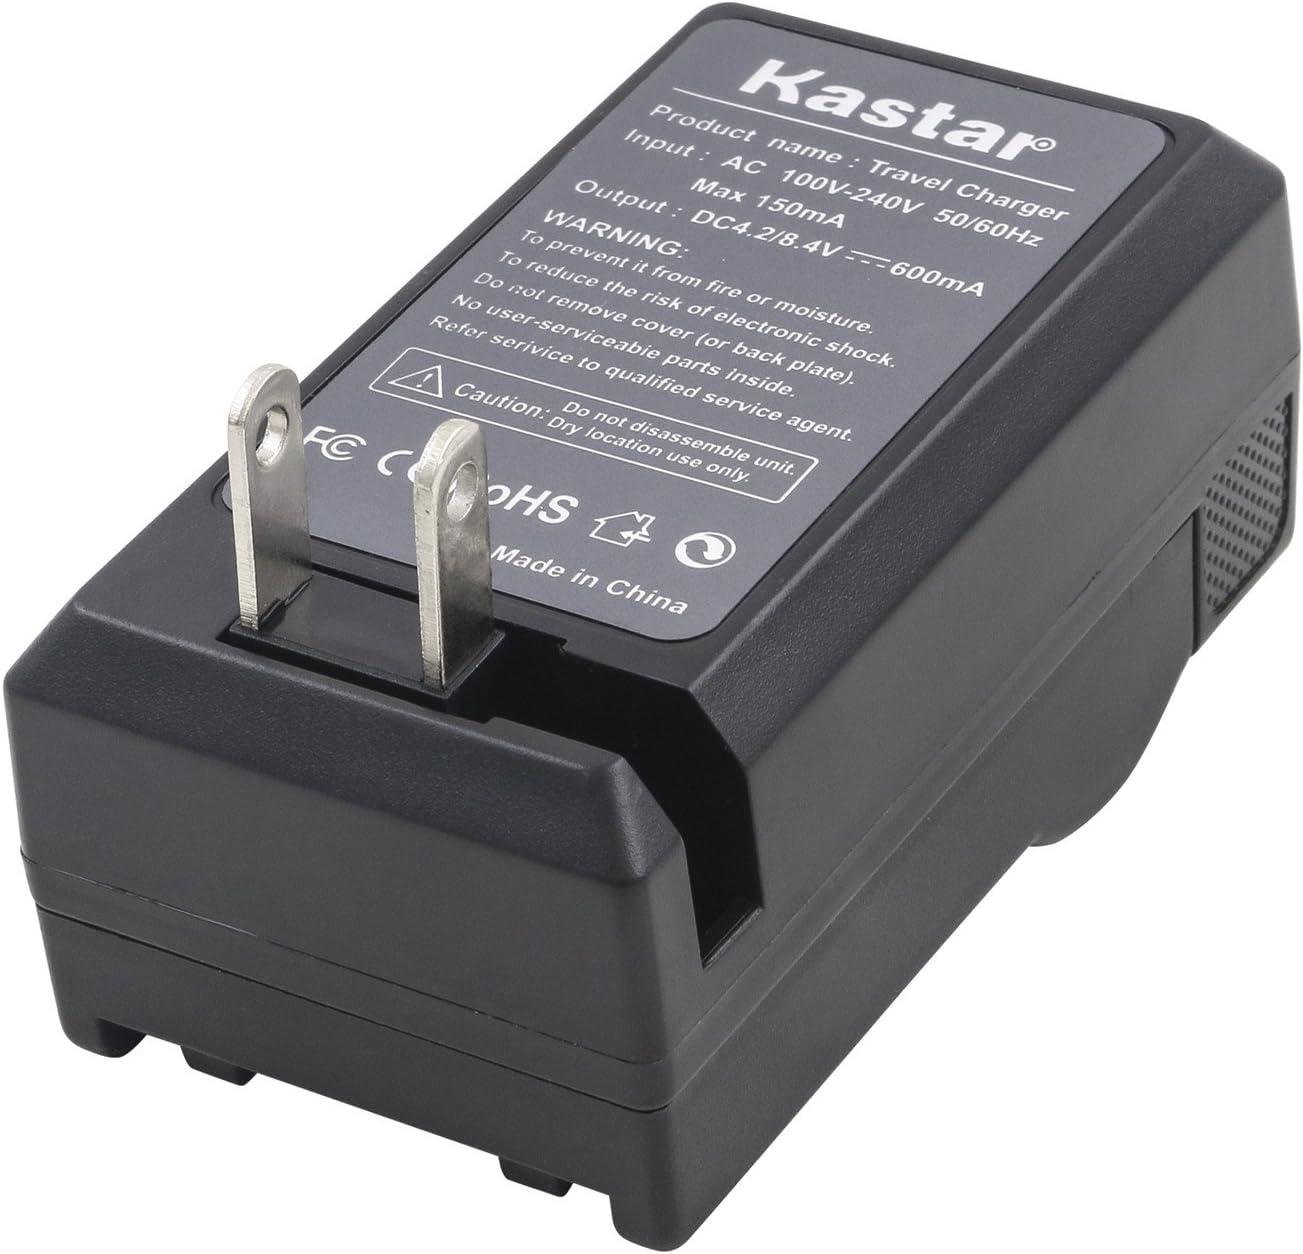 Kastar Travel Charger for JVC SSL-JVC50 and JVC GY-HMQ10 GY-HM200 GY-HM600 GY-HM600E GY-LS300 GY-HM600EC GY-HM650 Camcorders